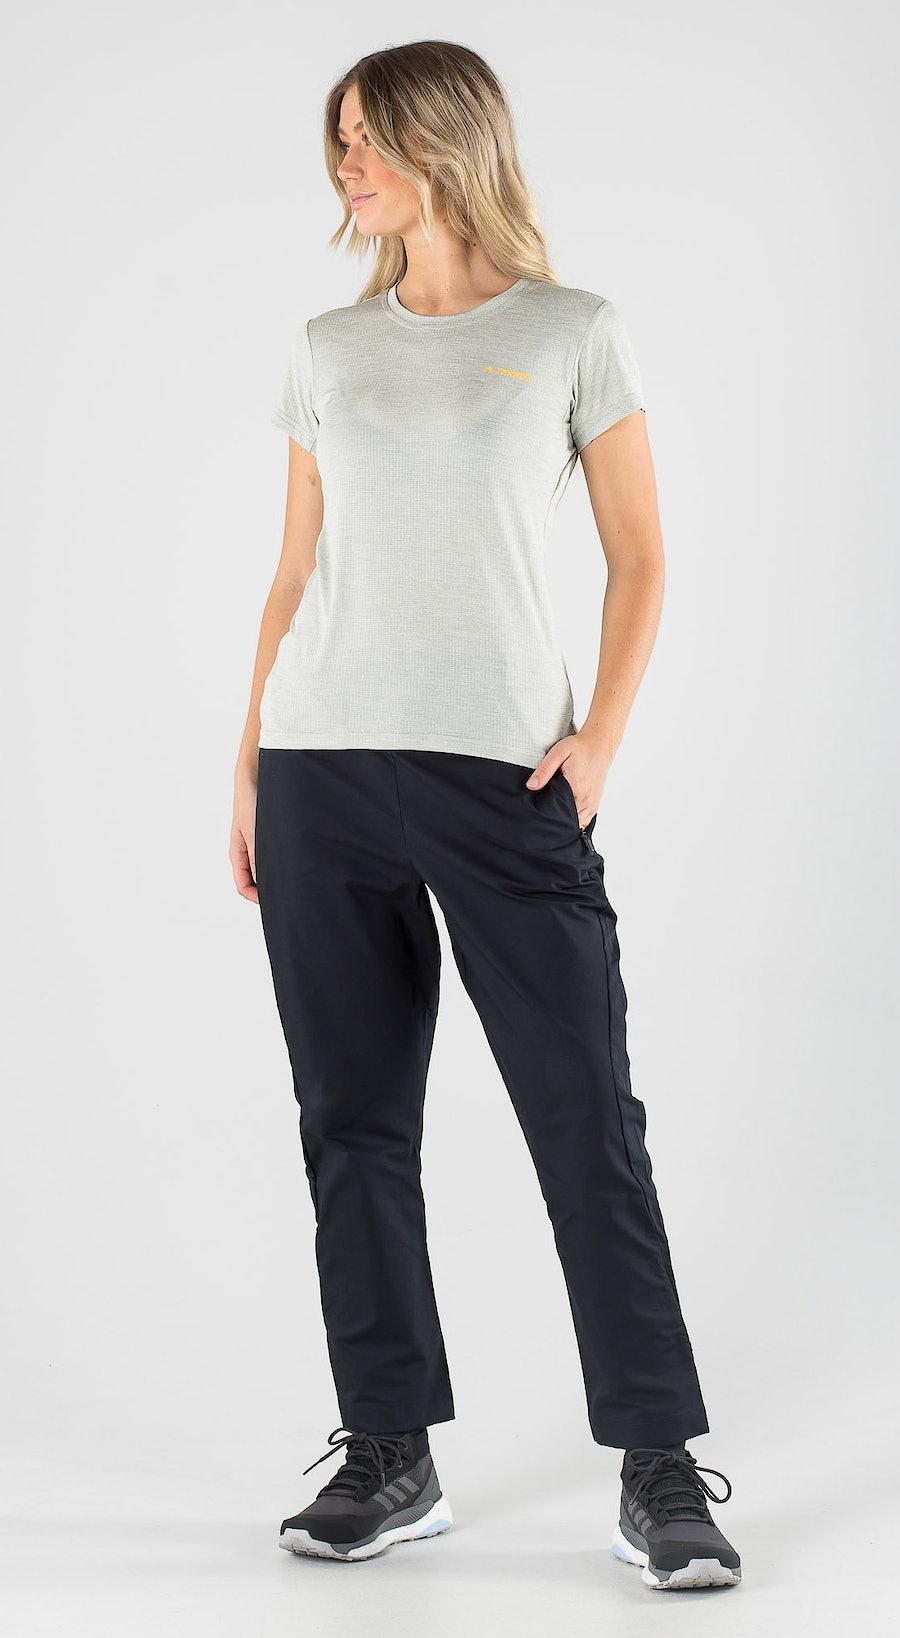 Adidas Terrex Tivid Metal Grey Outfit Multi